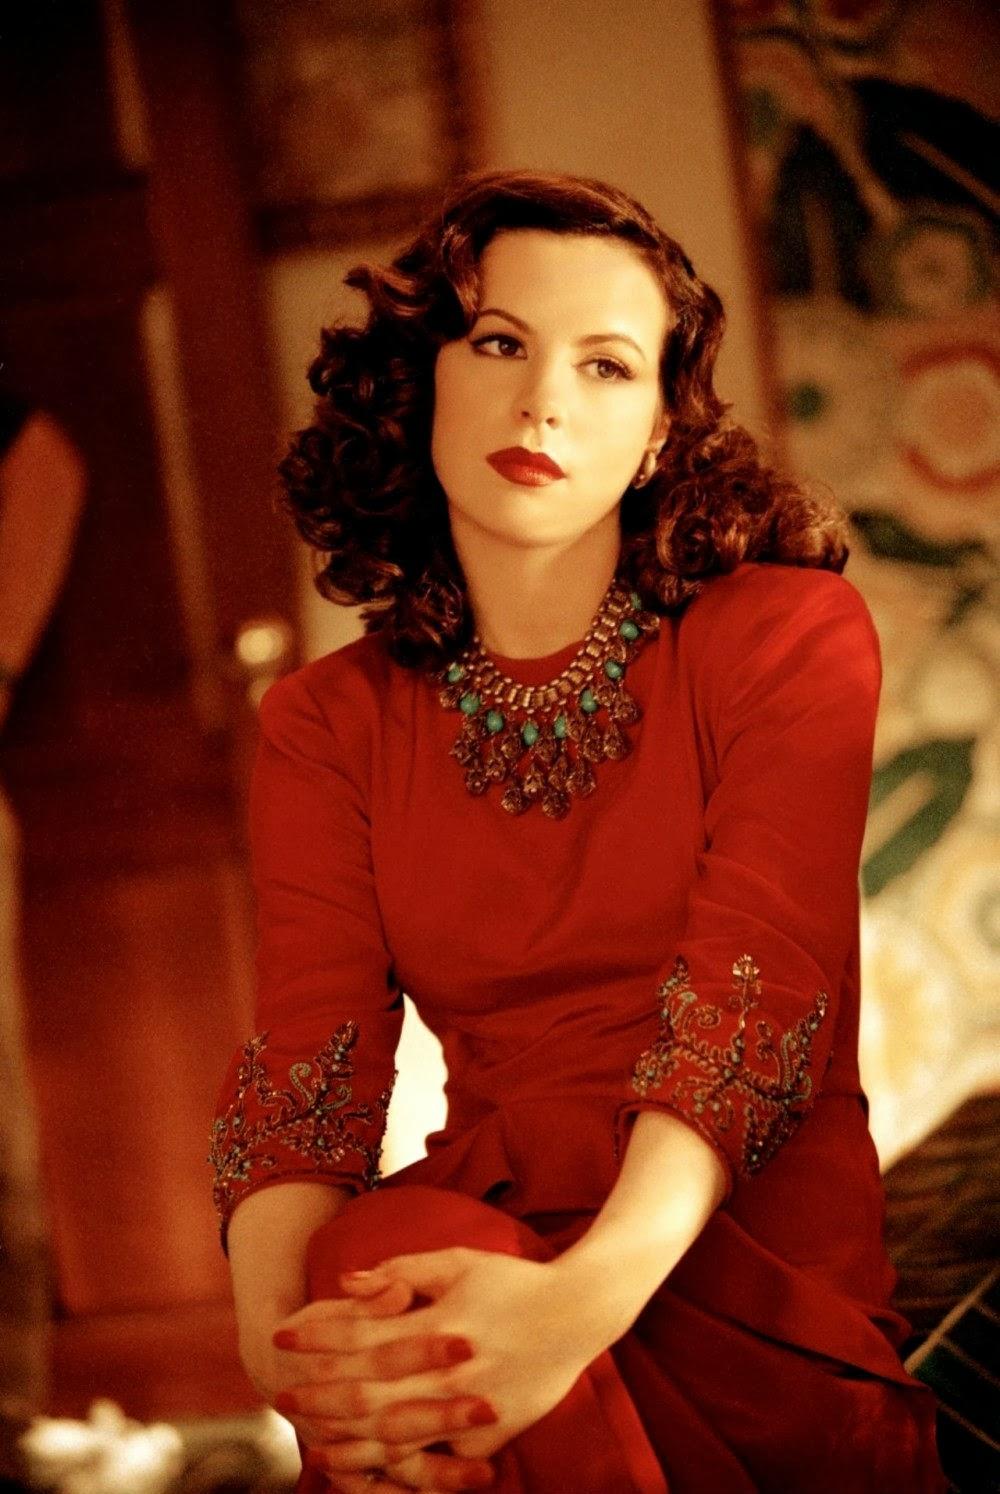 When Fashion Met Film Cate Blanchett Vs Kate Beckinsale